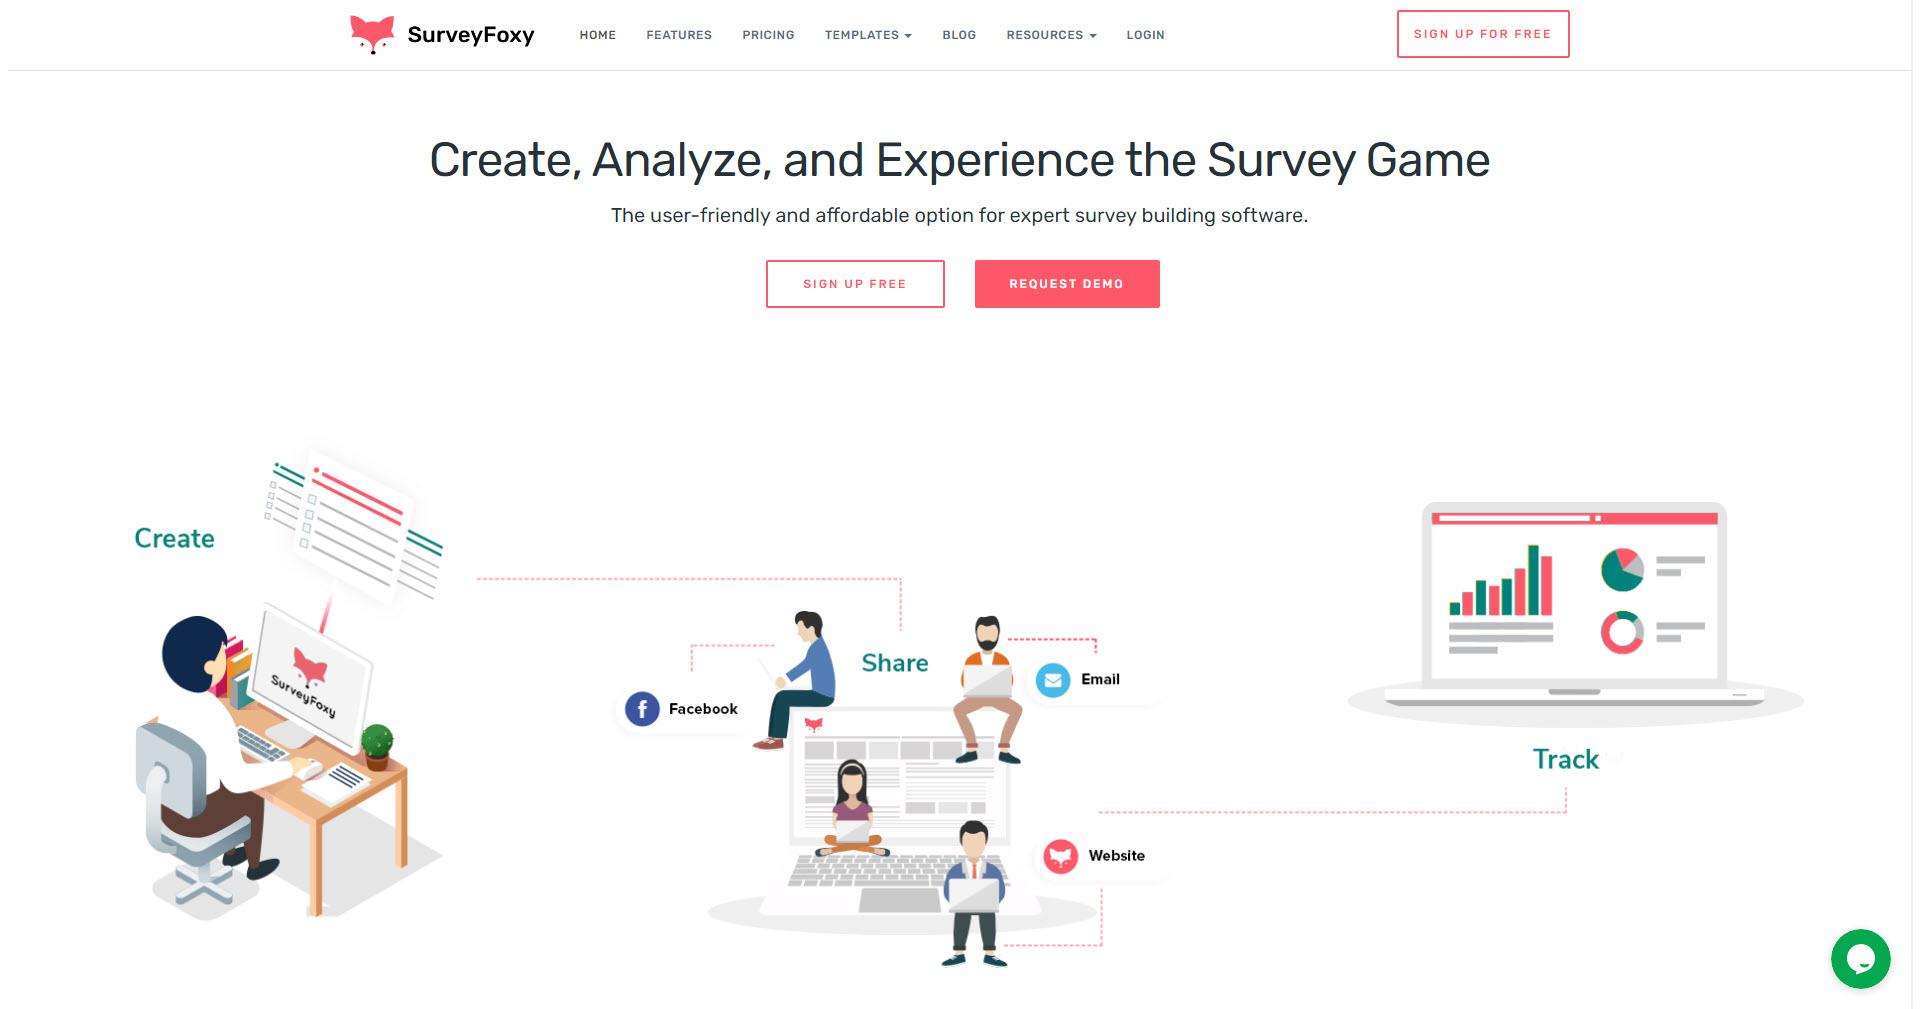 SurveyFoxy